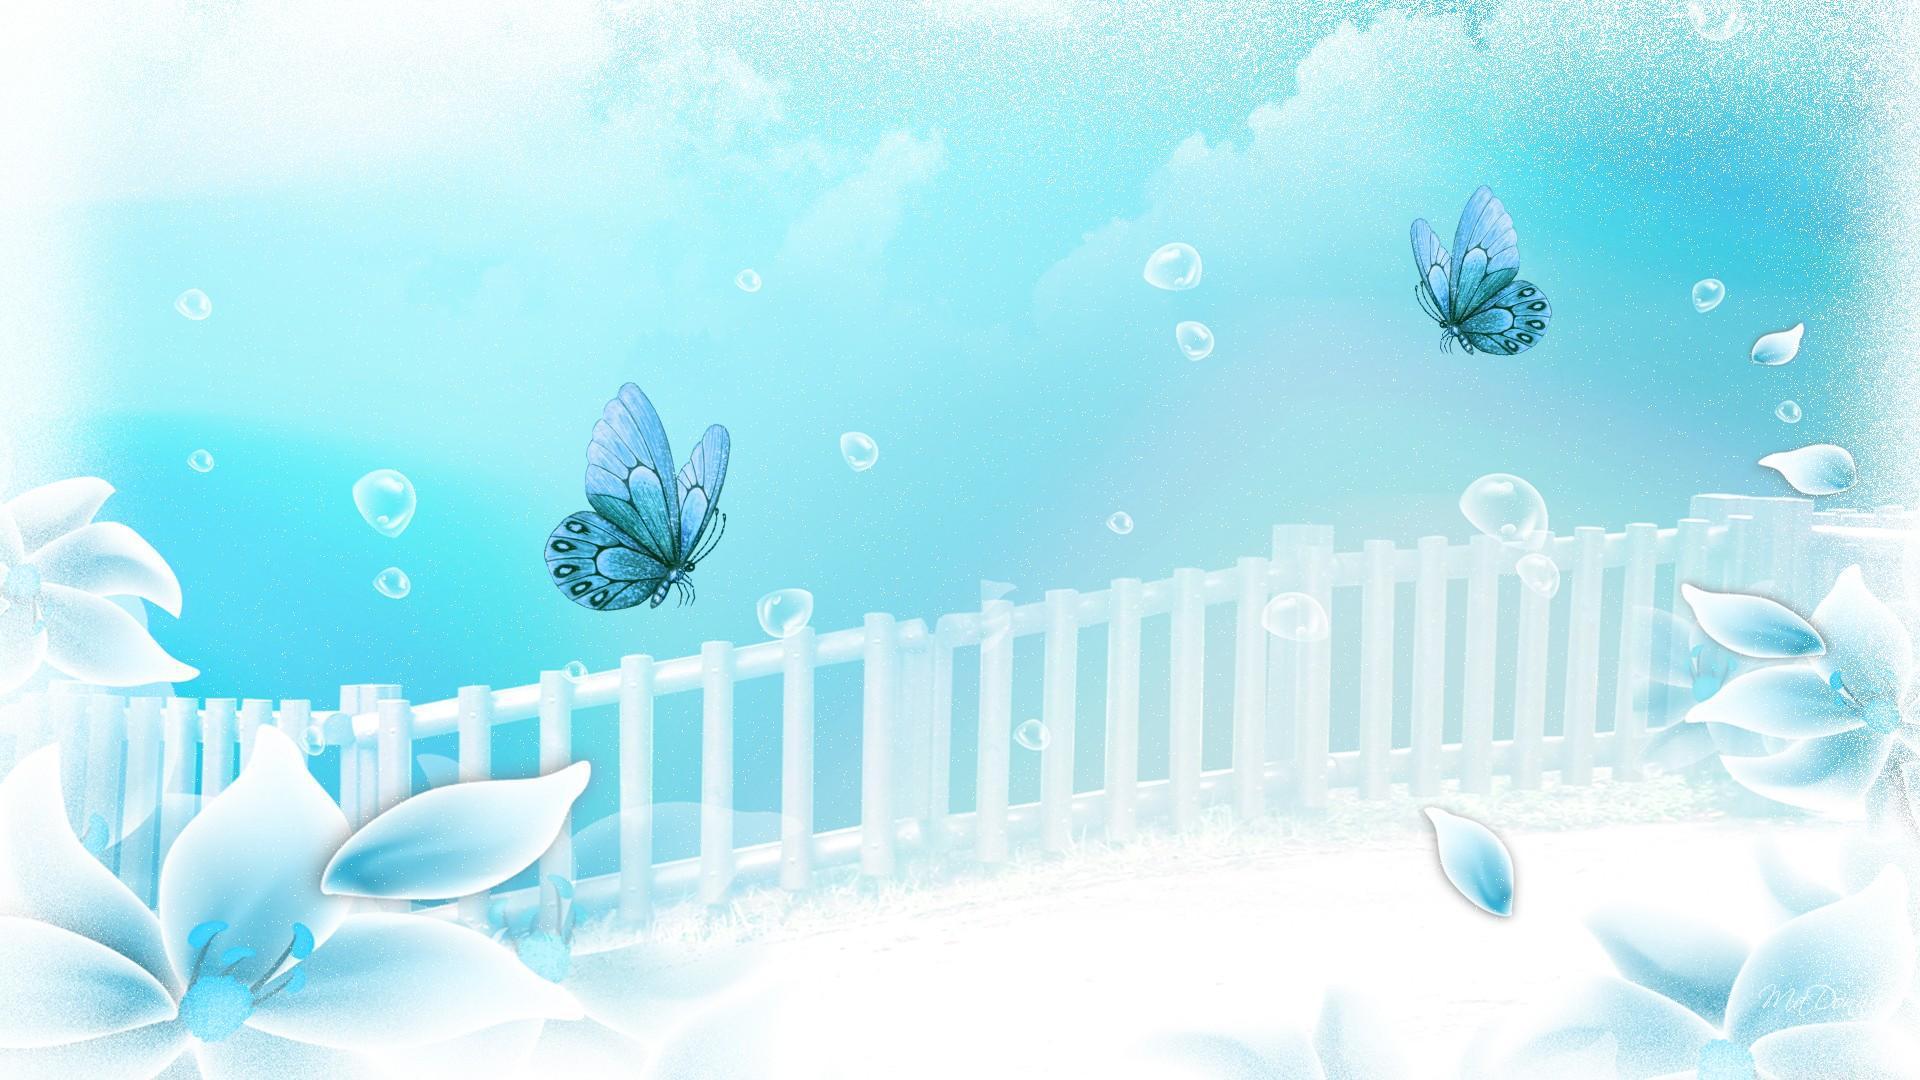 Beautiful Cute Roses Wallpapers Flor Acu 225 Tica So 241 Ador Fondo De Escritorio Hd Pantalla